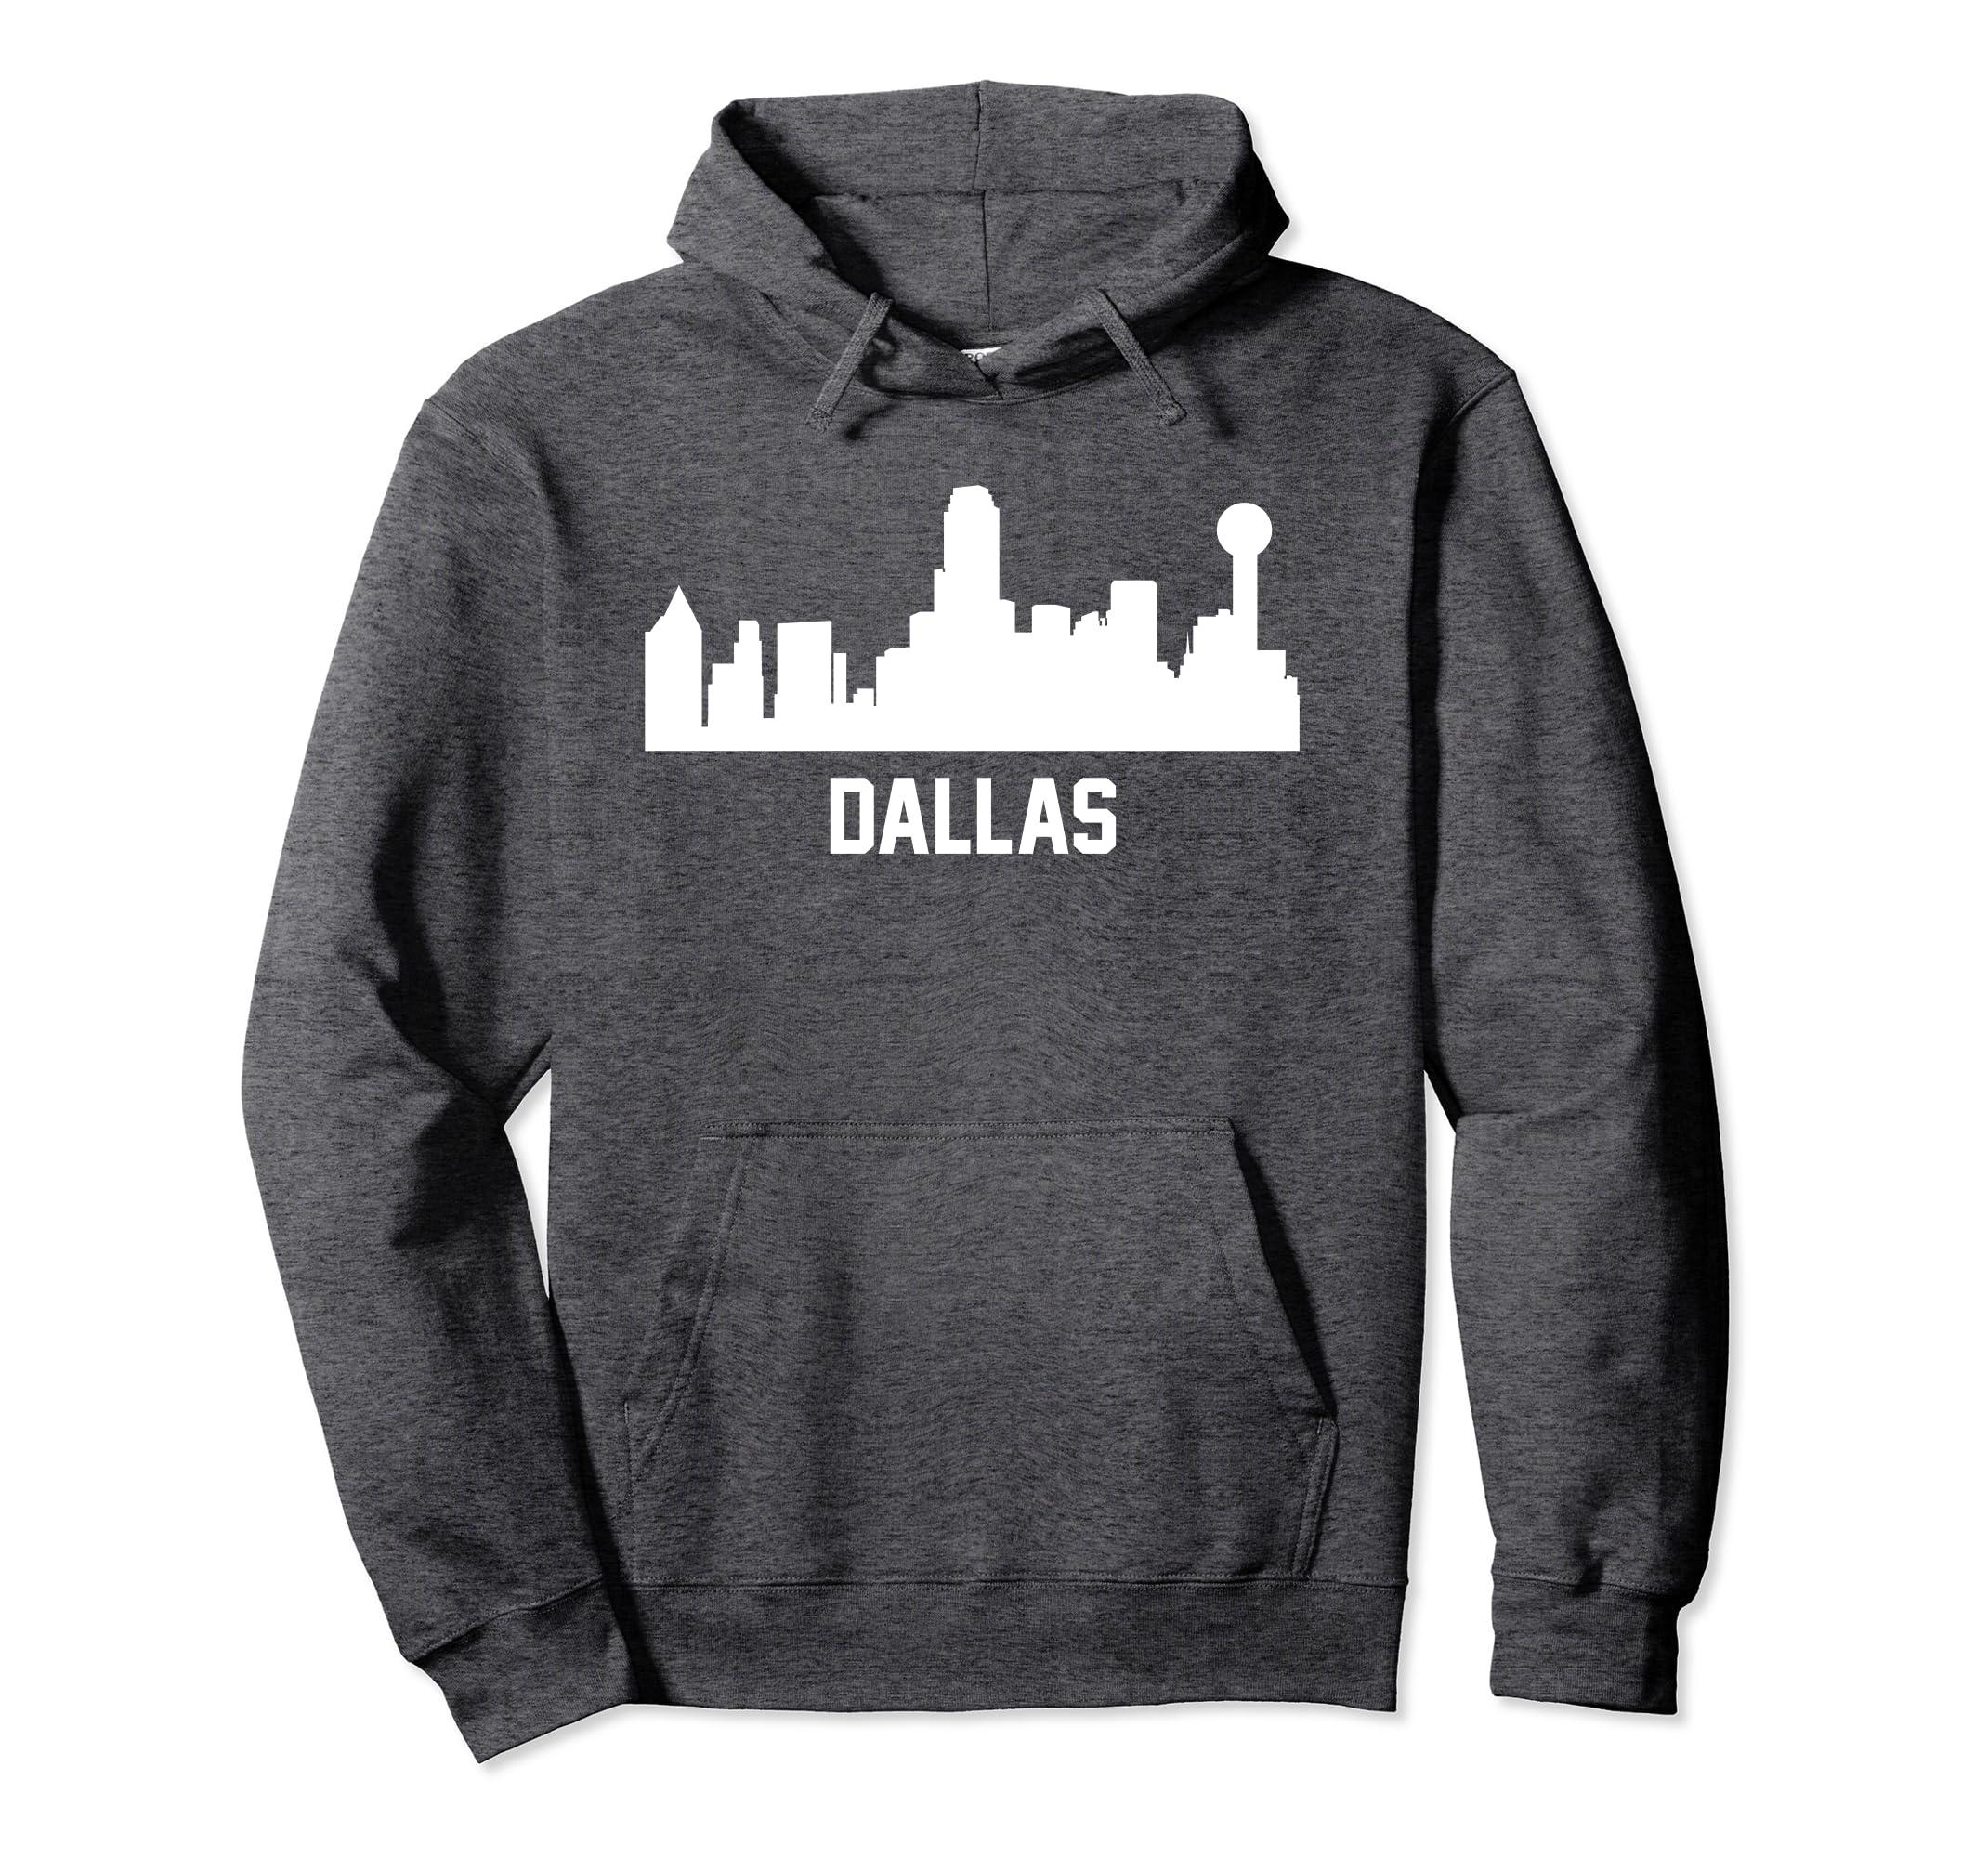 Dallas Texas Skyline Cityscape Hoodie-Teechatpro